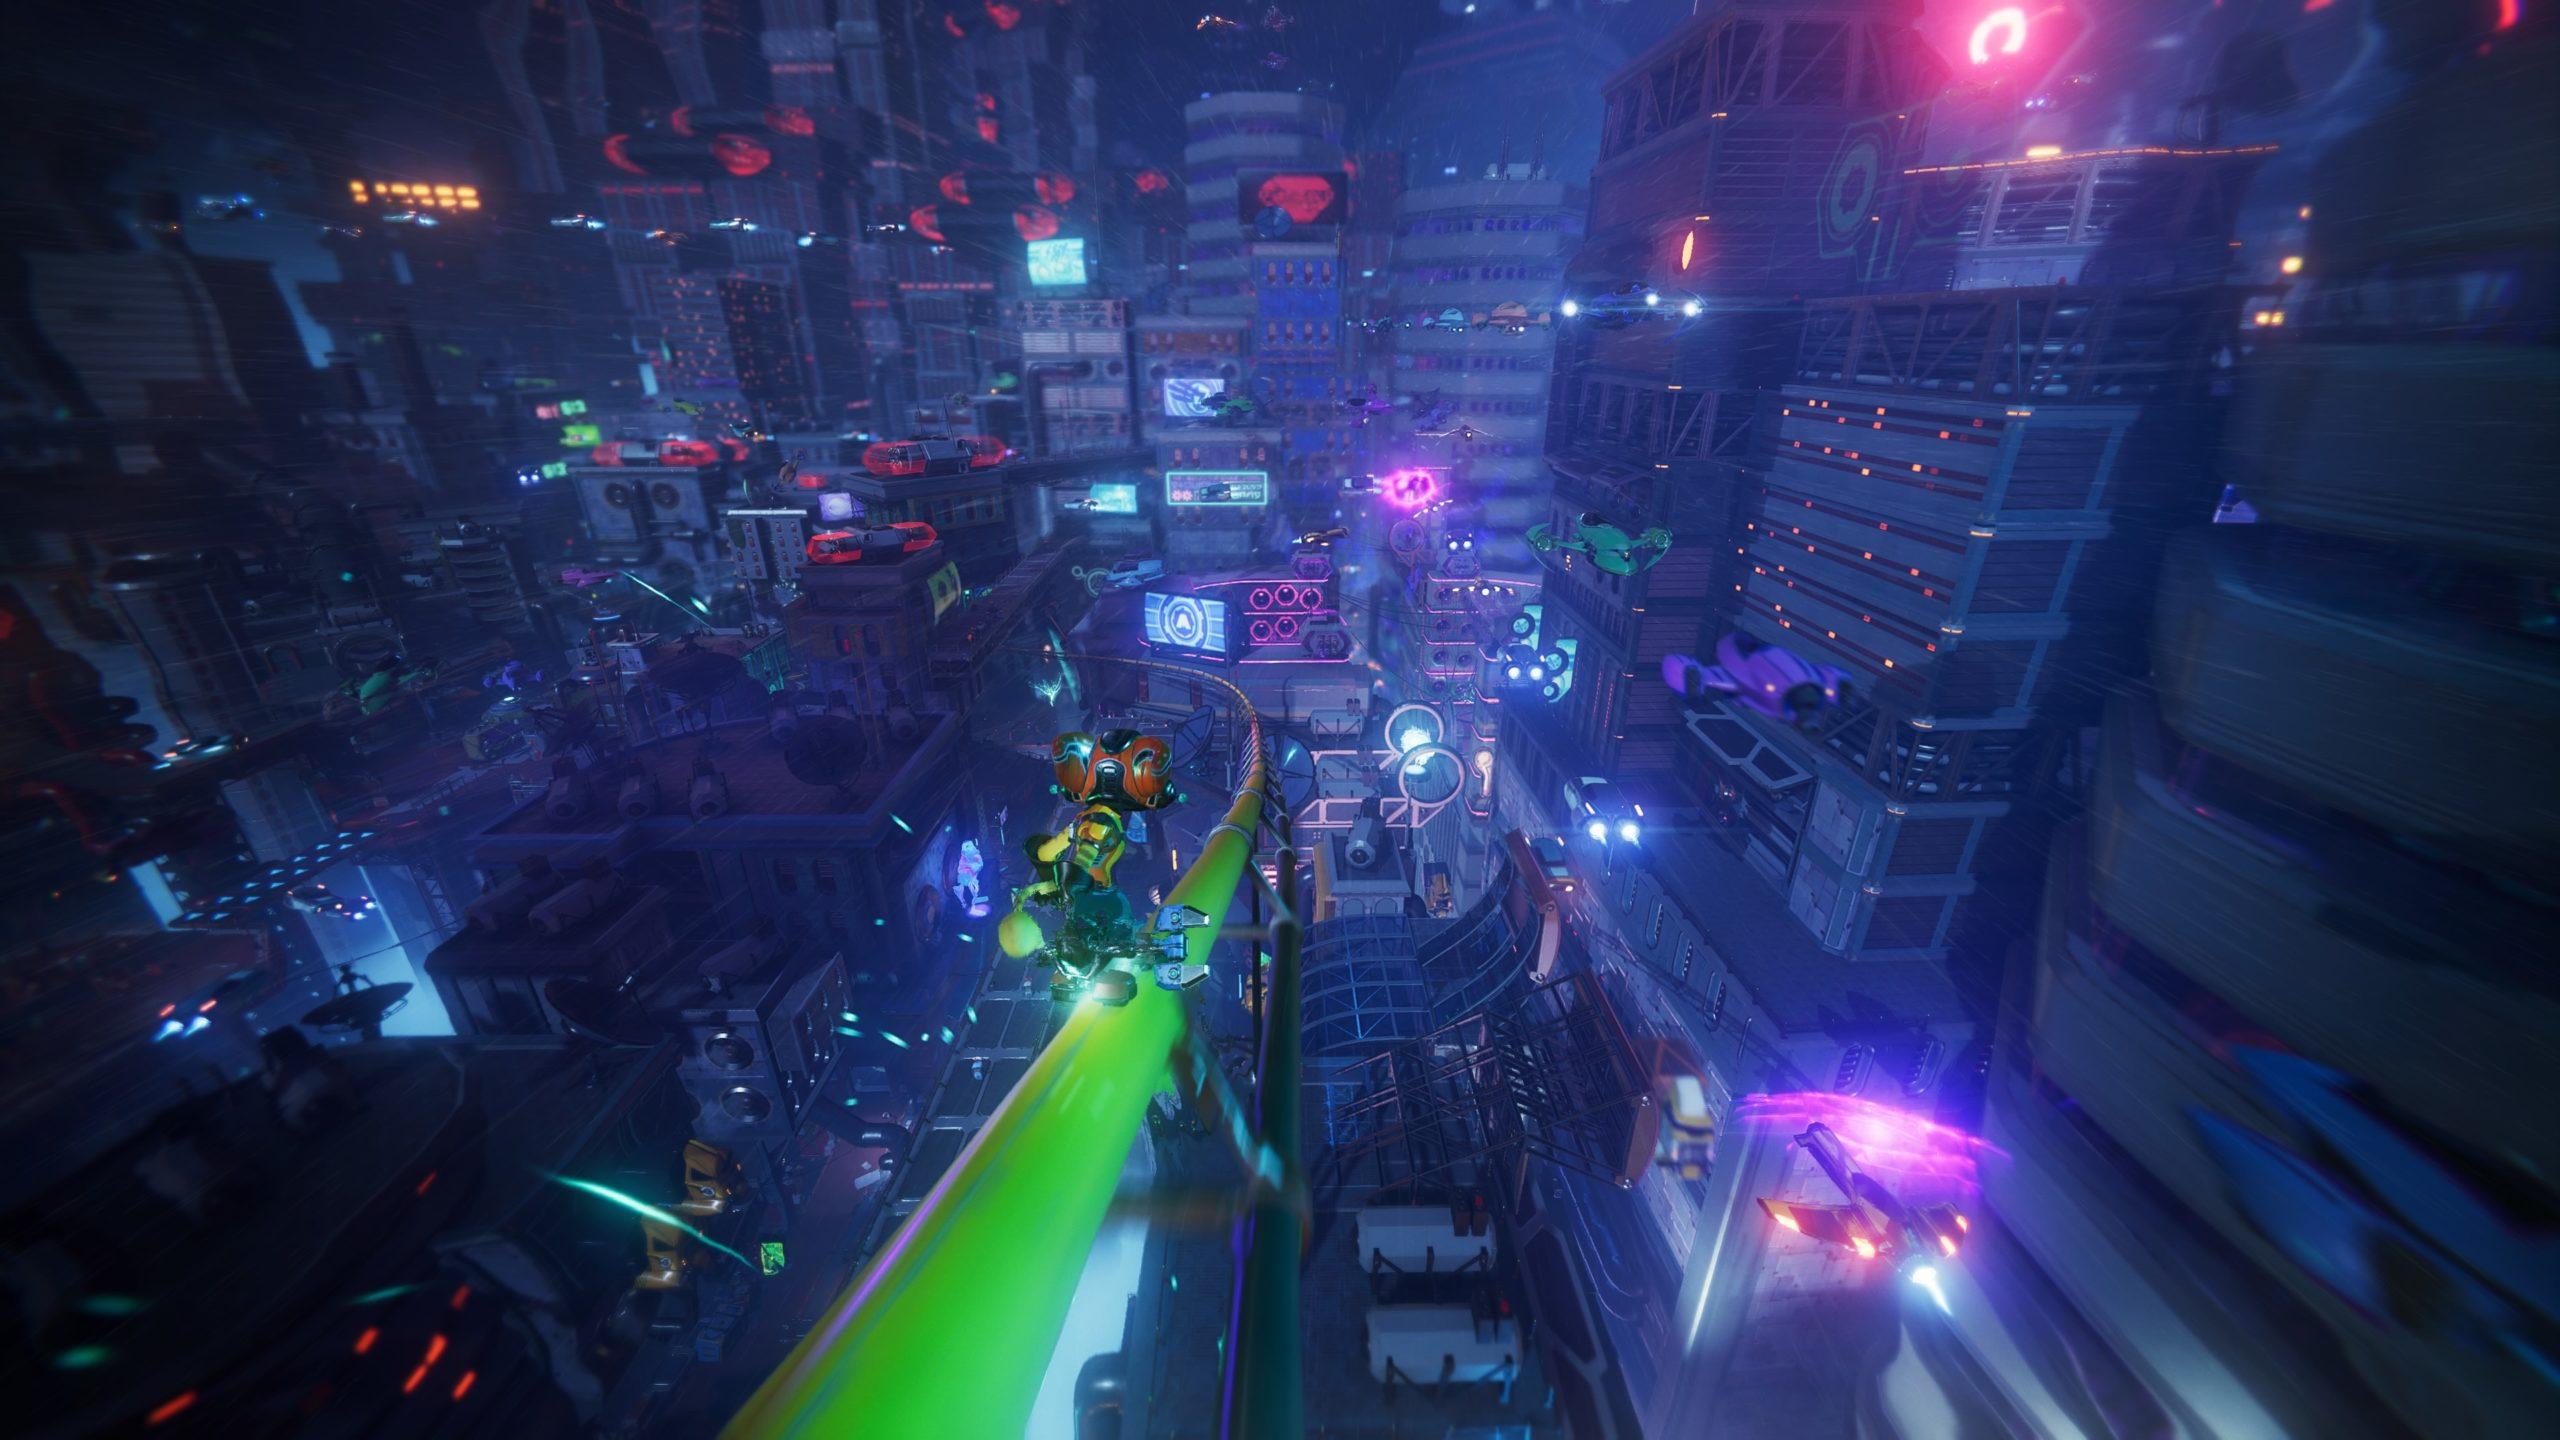 Ratchet  Clank Una dimensión aparte reseña review análisis crítica rift Apart PS5 PlayStation 5